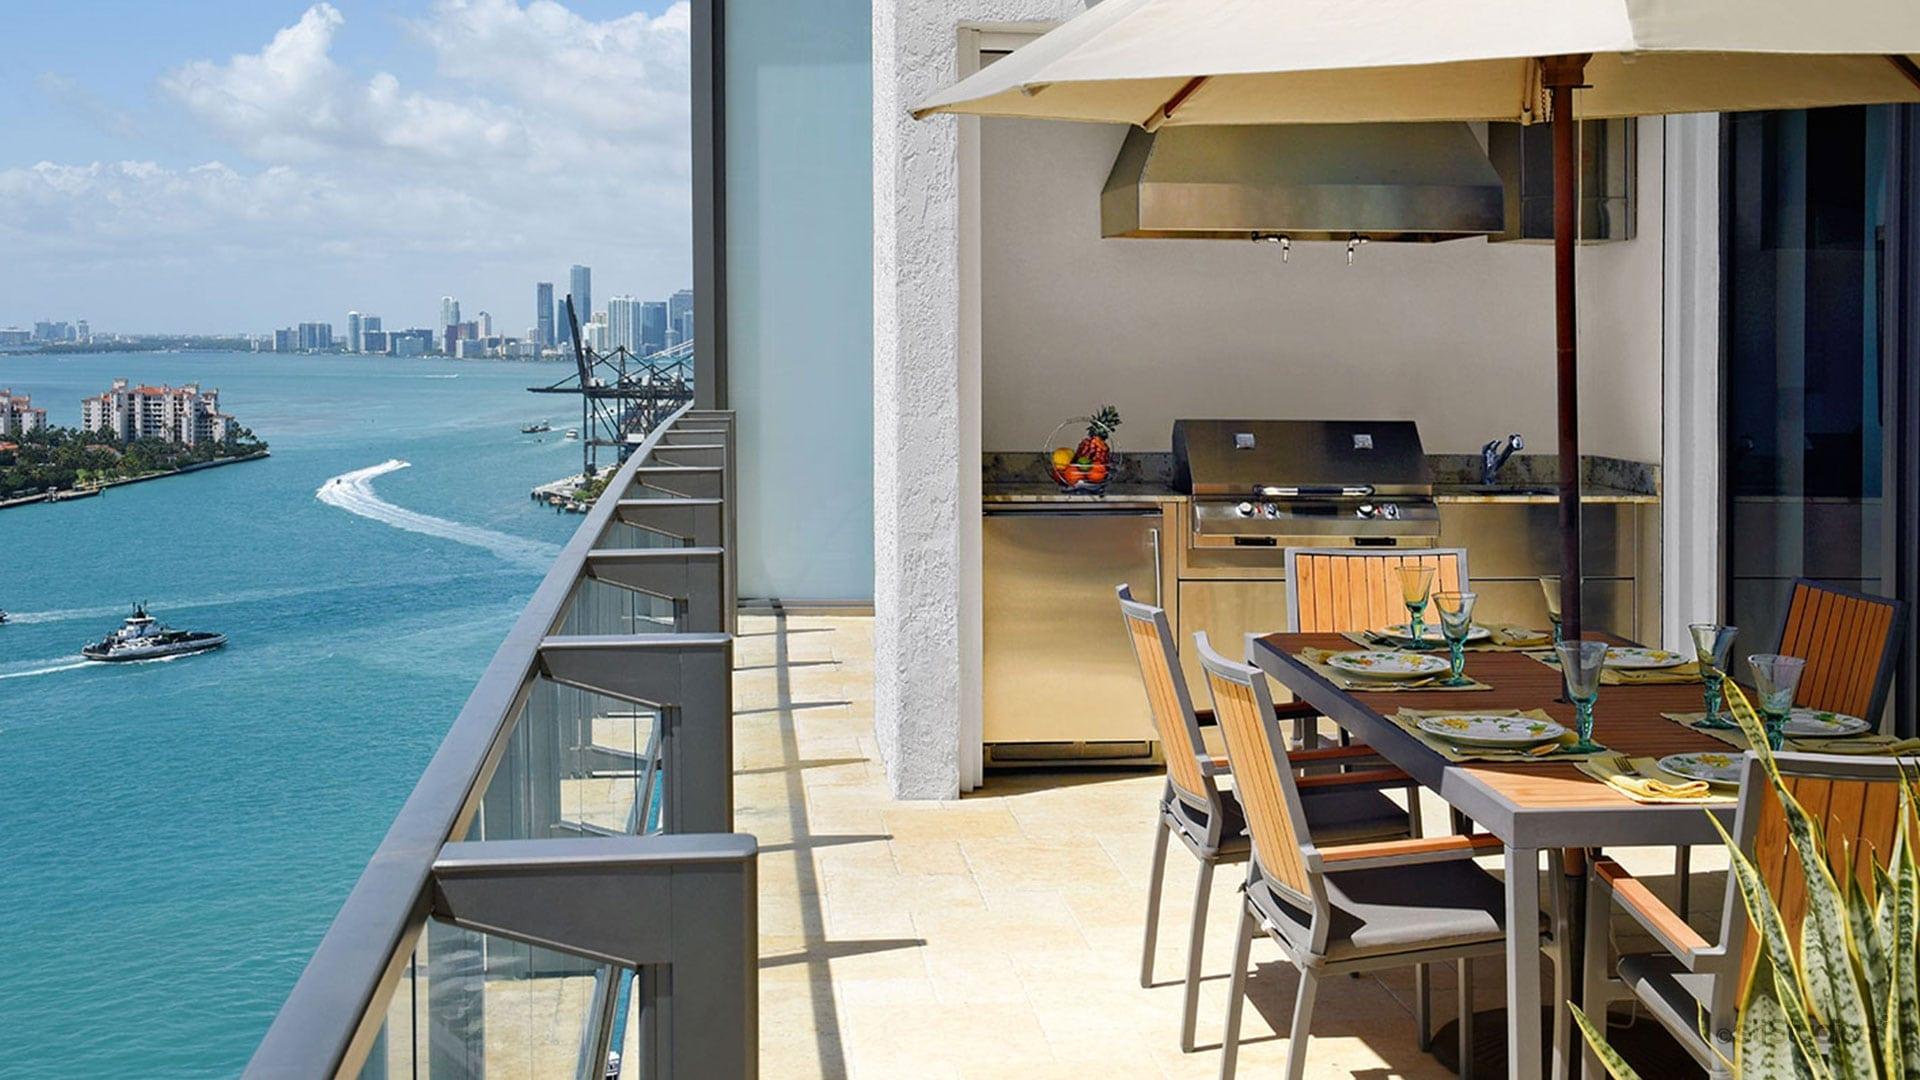 Muchnik Construction Group Web Design - sliStudios Web Development Miami Beach